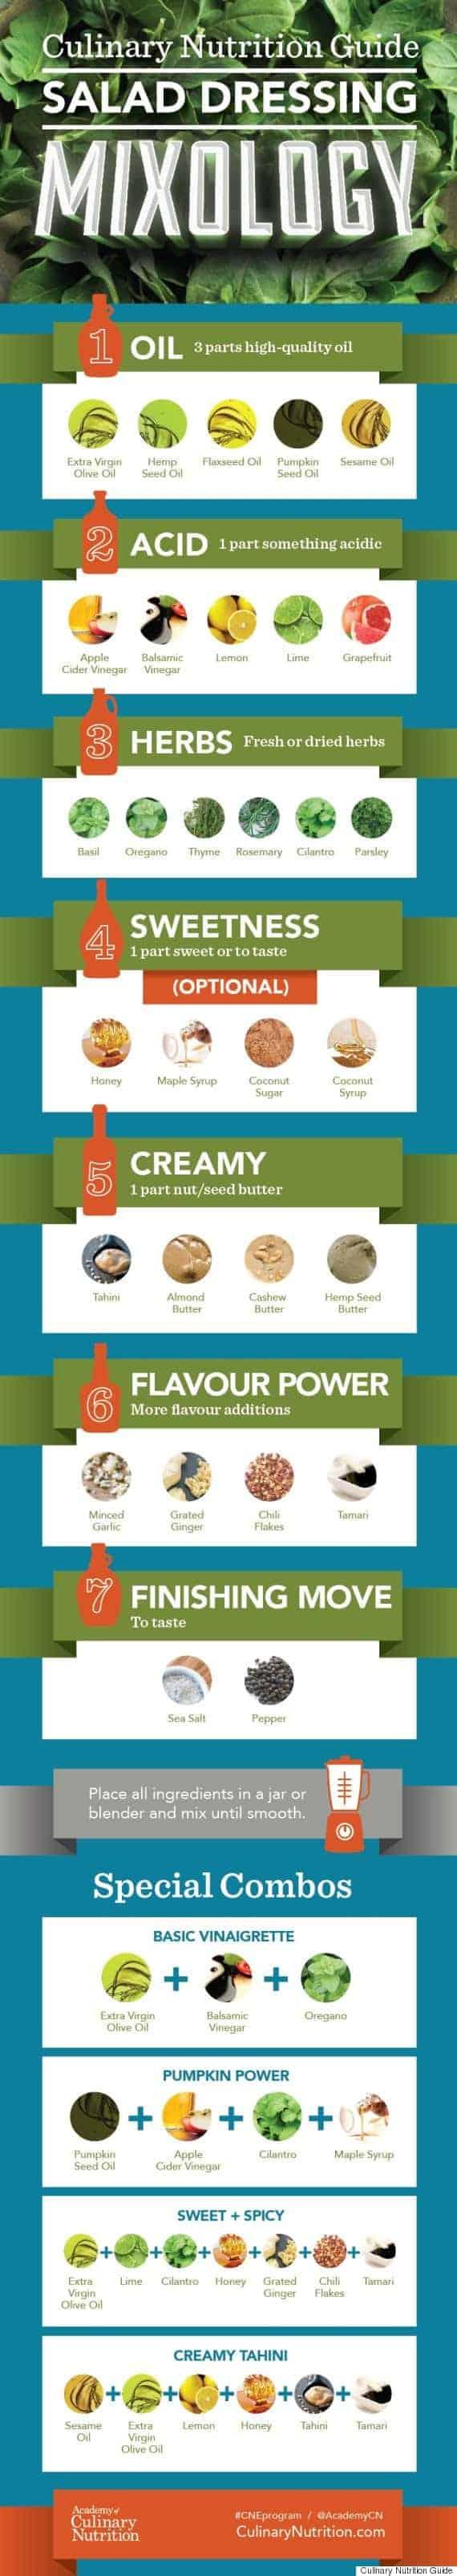 salad dressing infographic